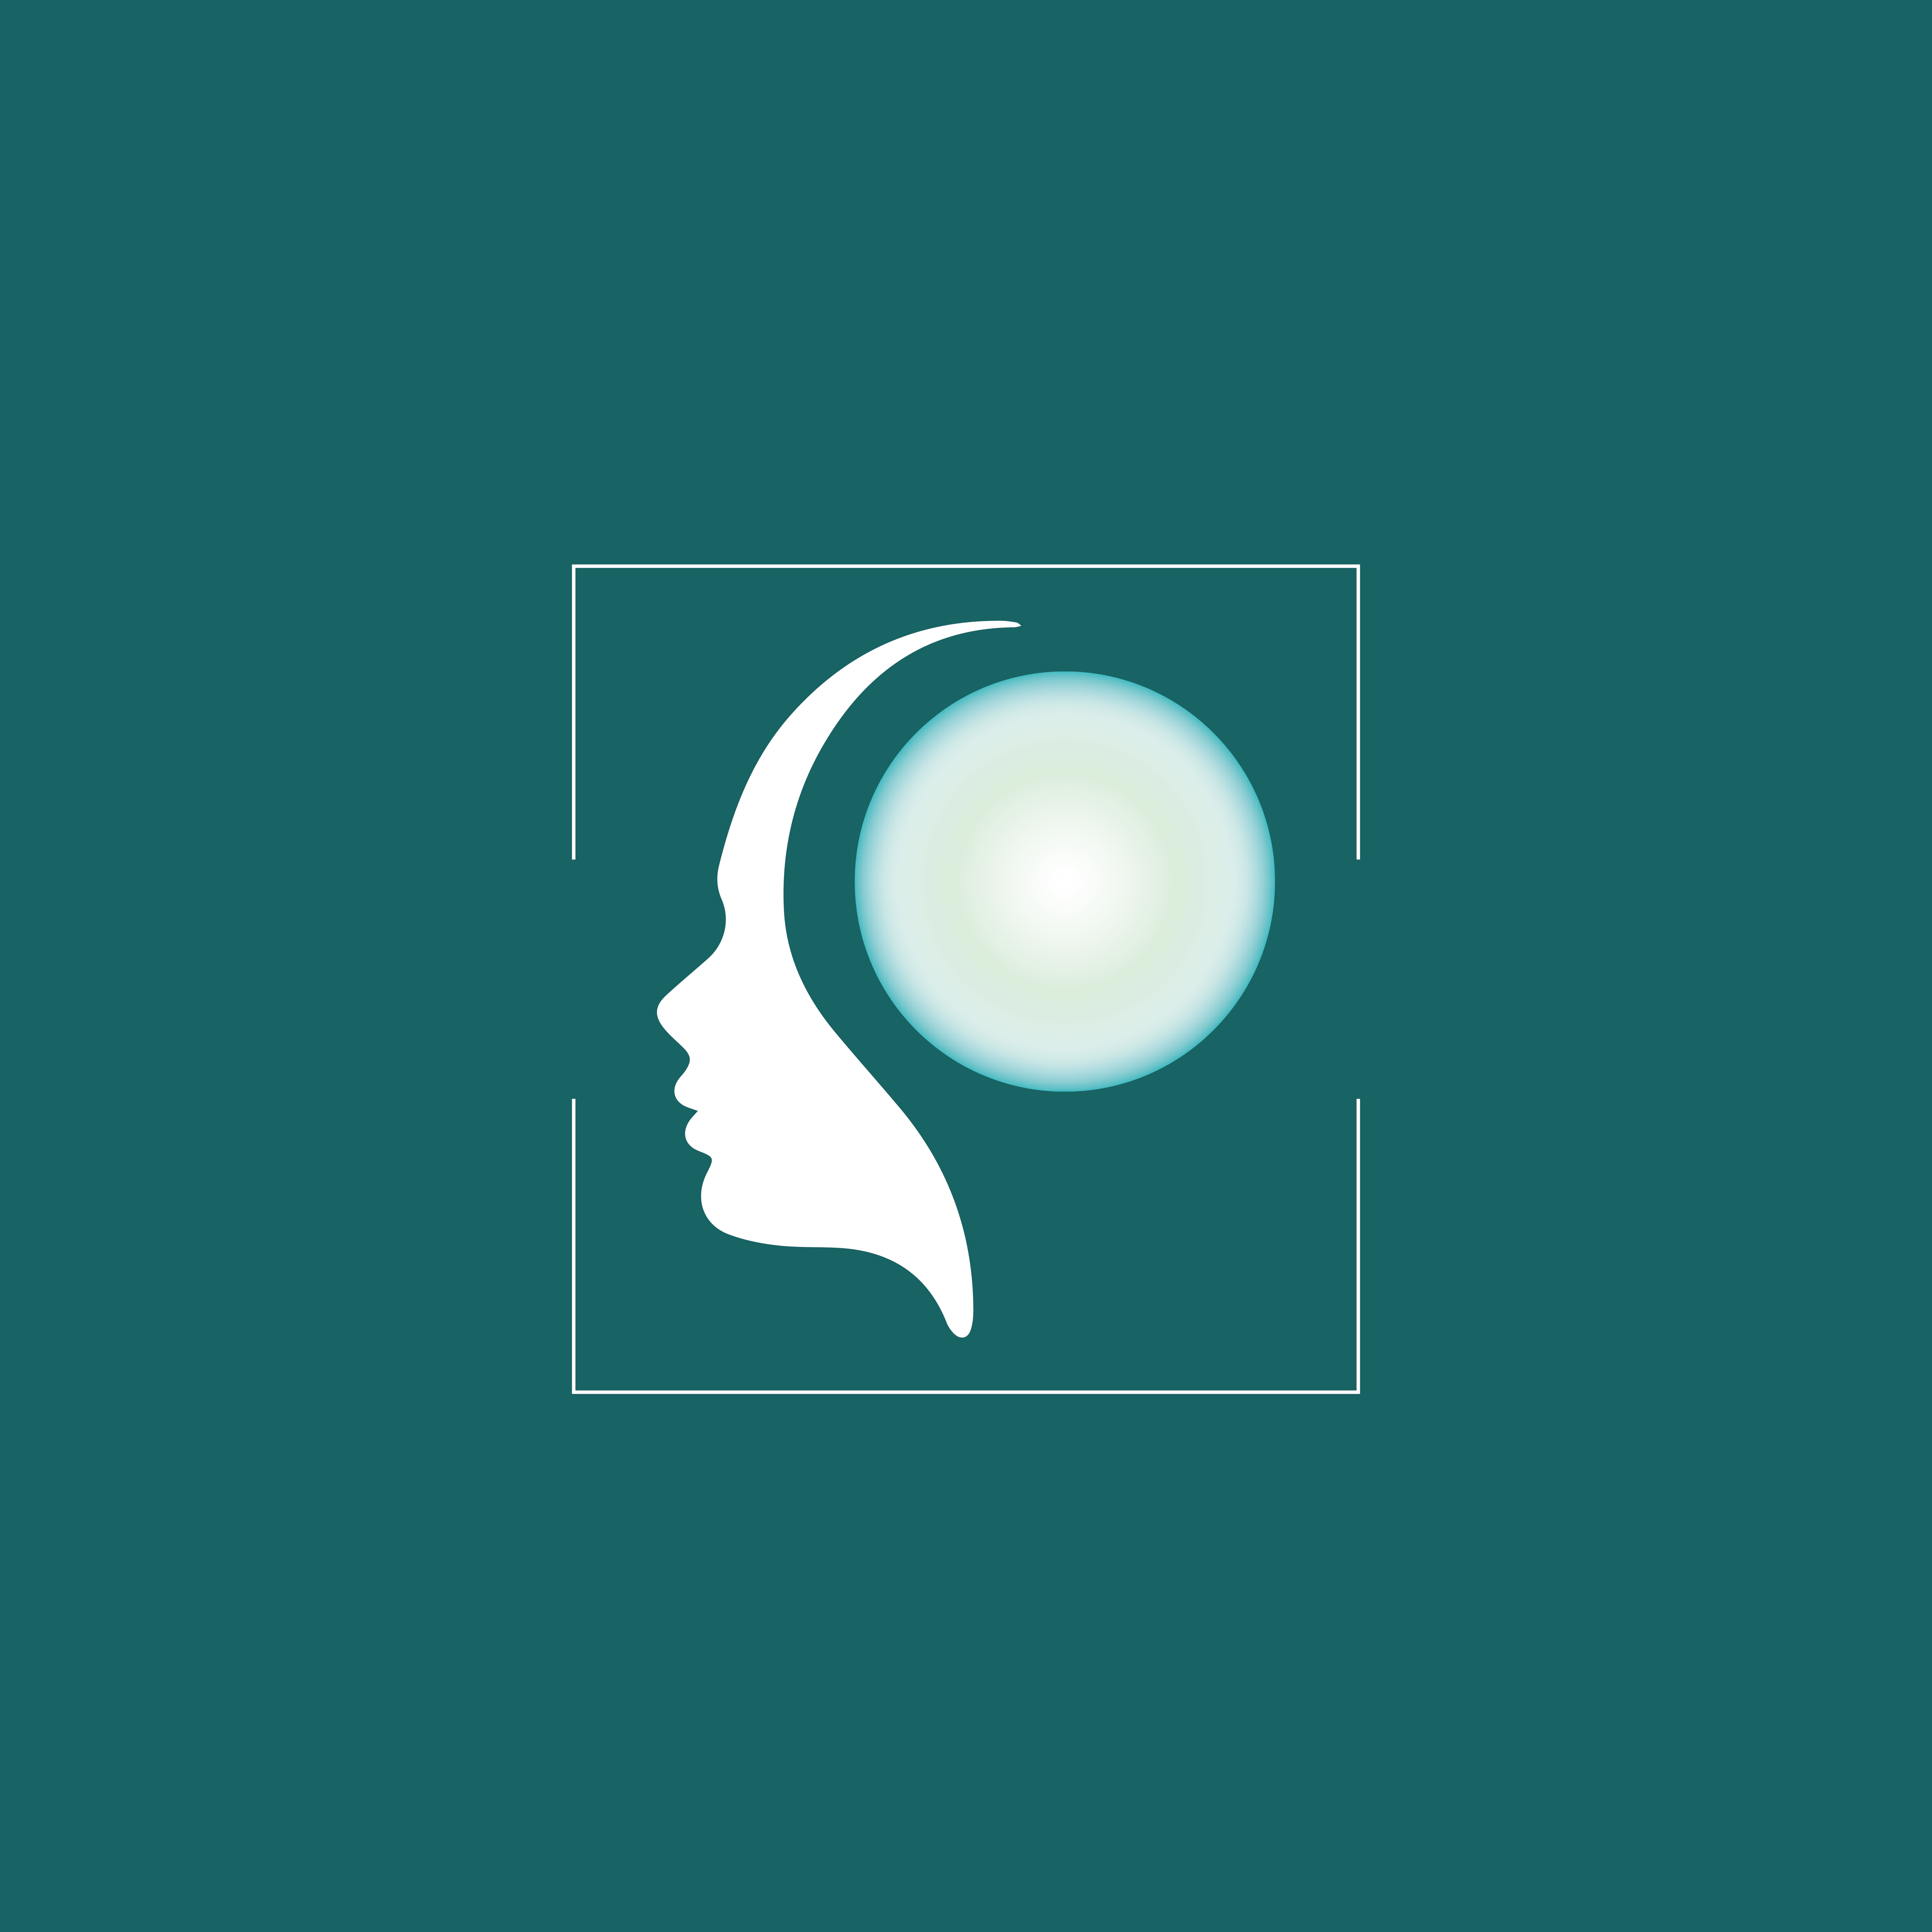 logo_therapie_corporelle